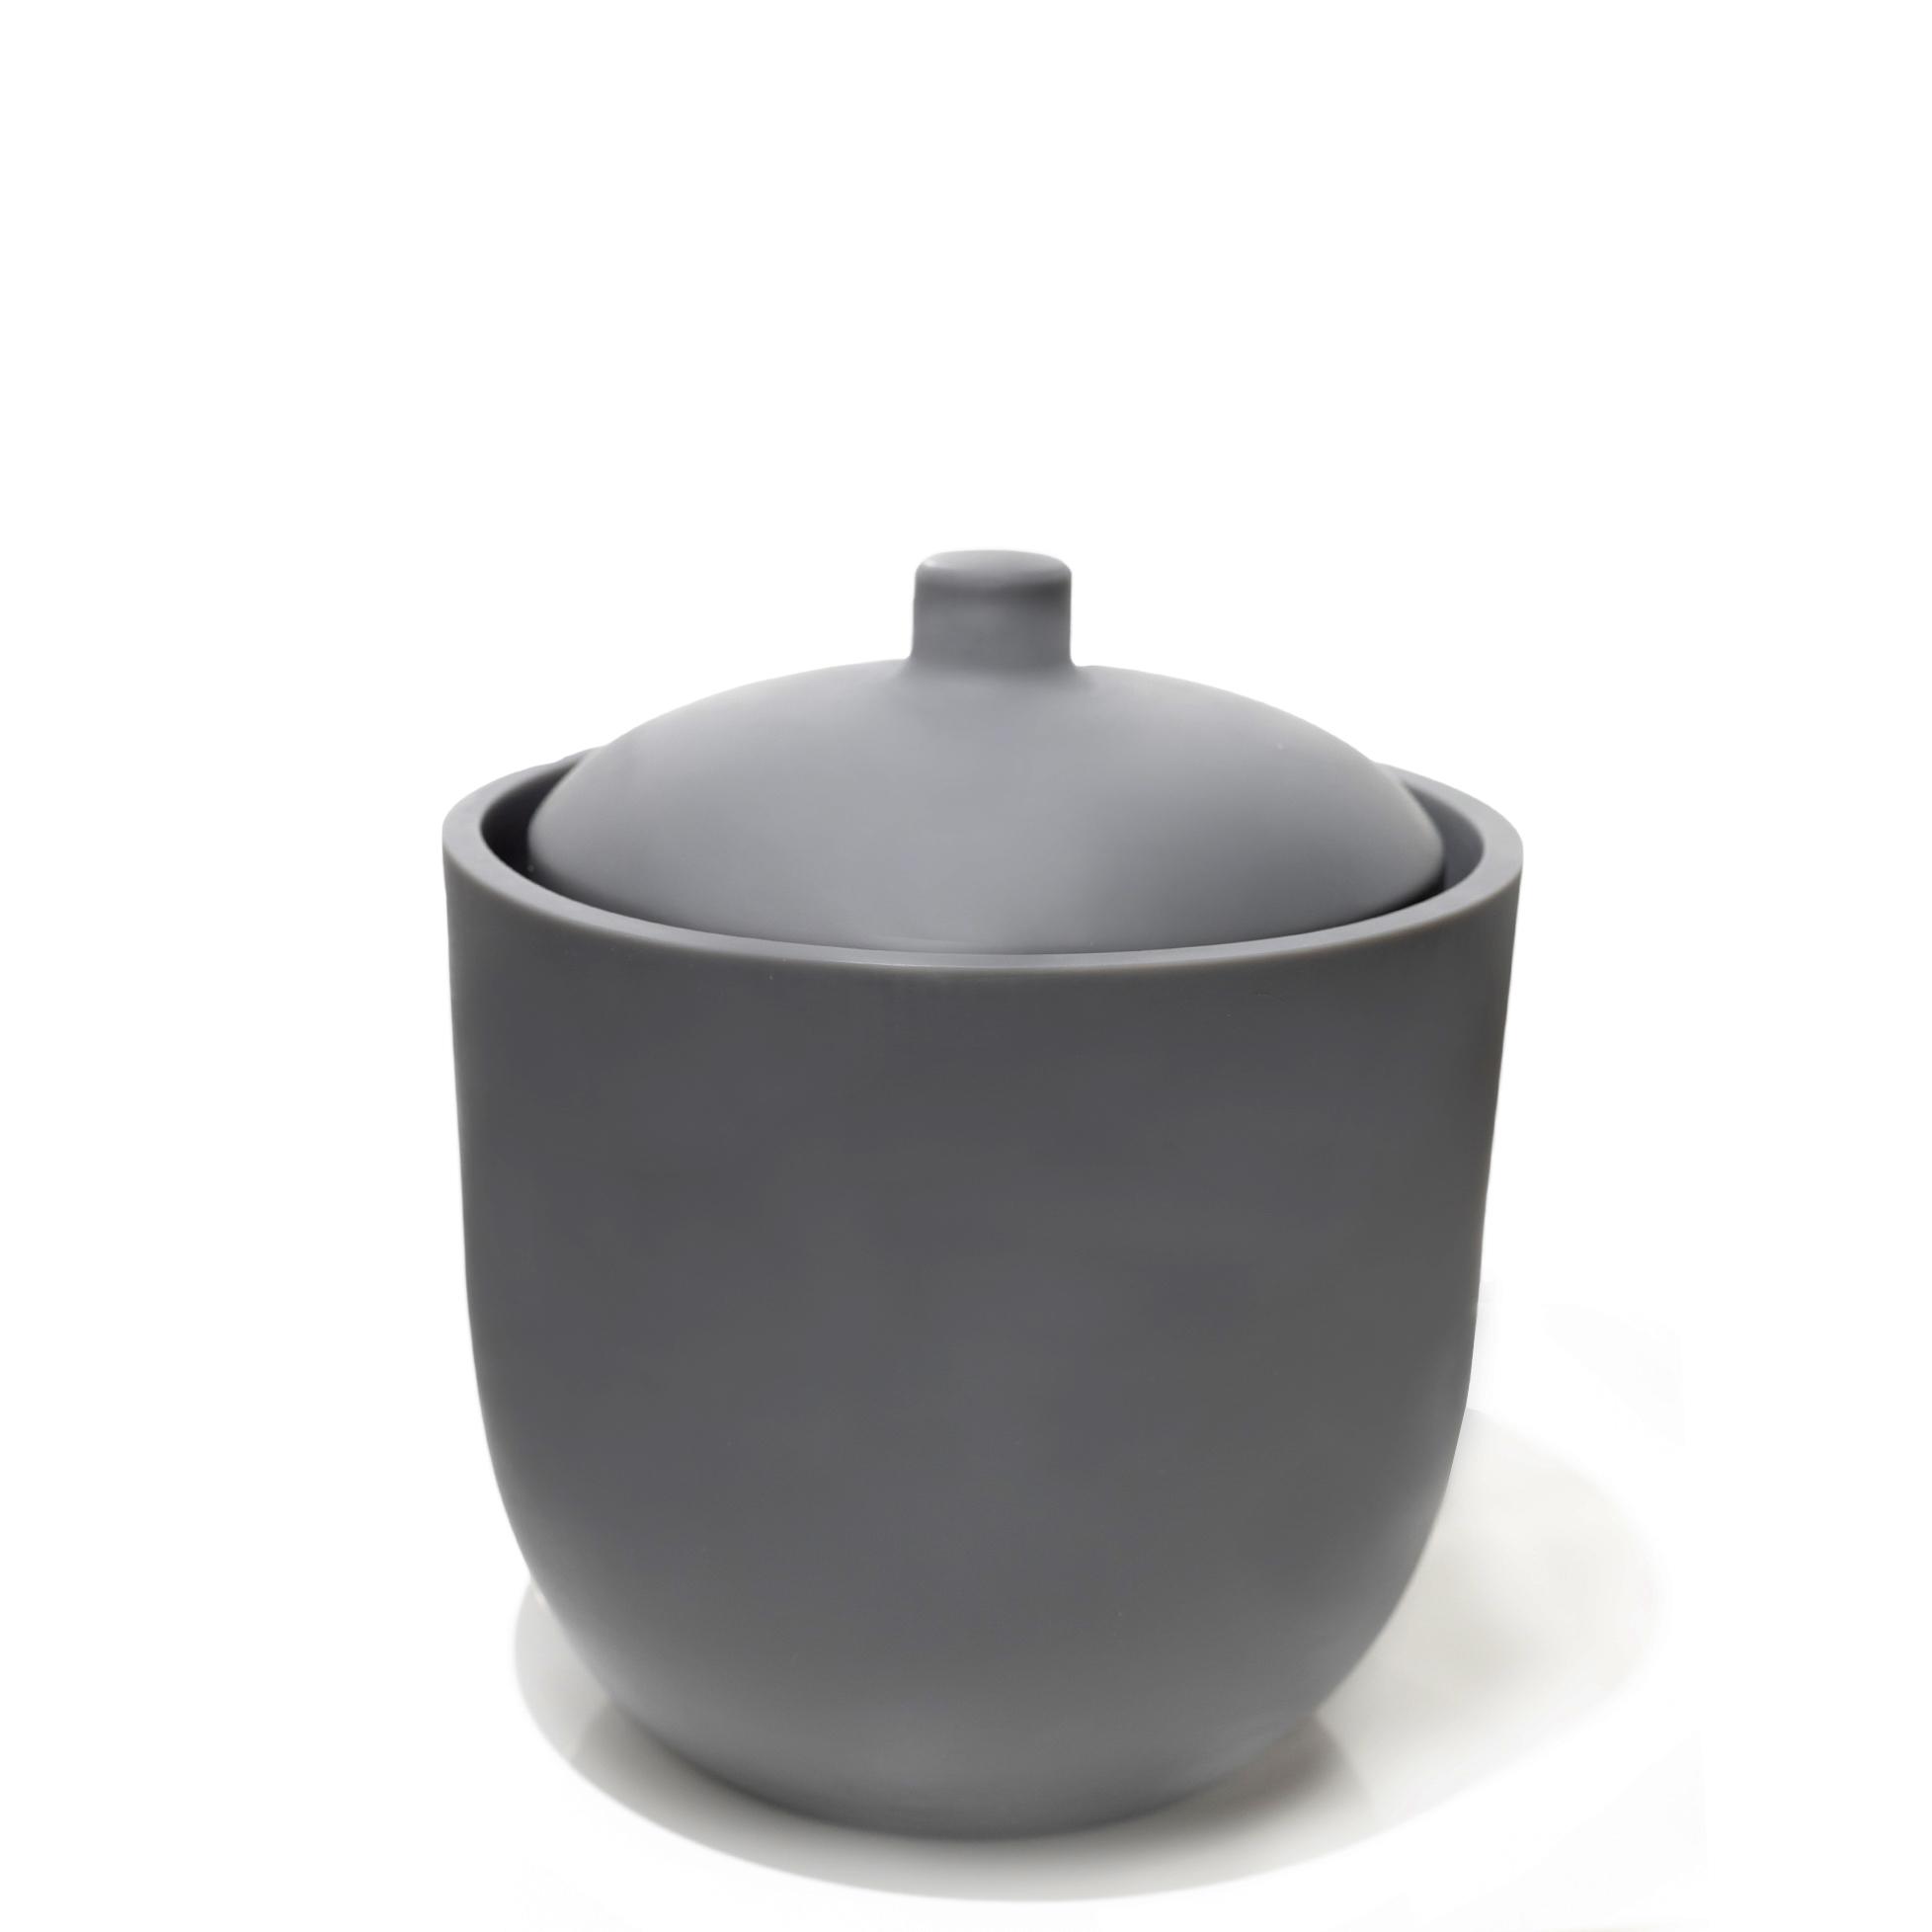 3D Printing Materials - Standard Resin - Makelab - Standard Resin Urn